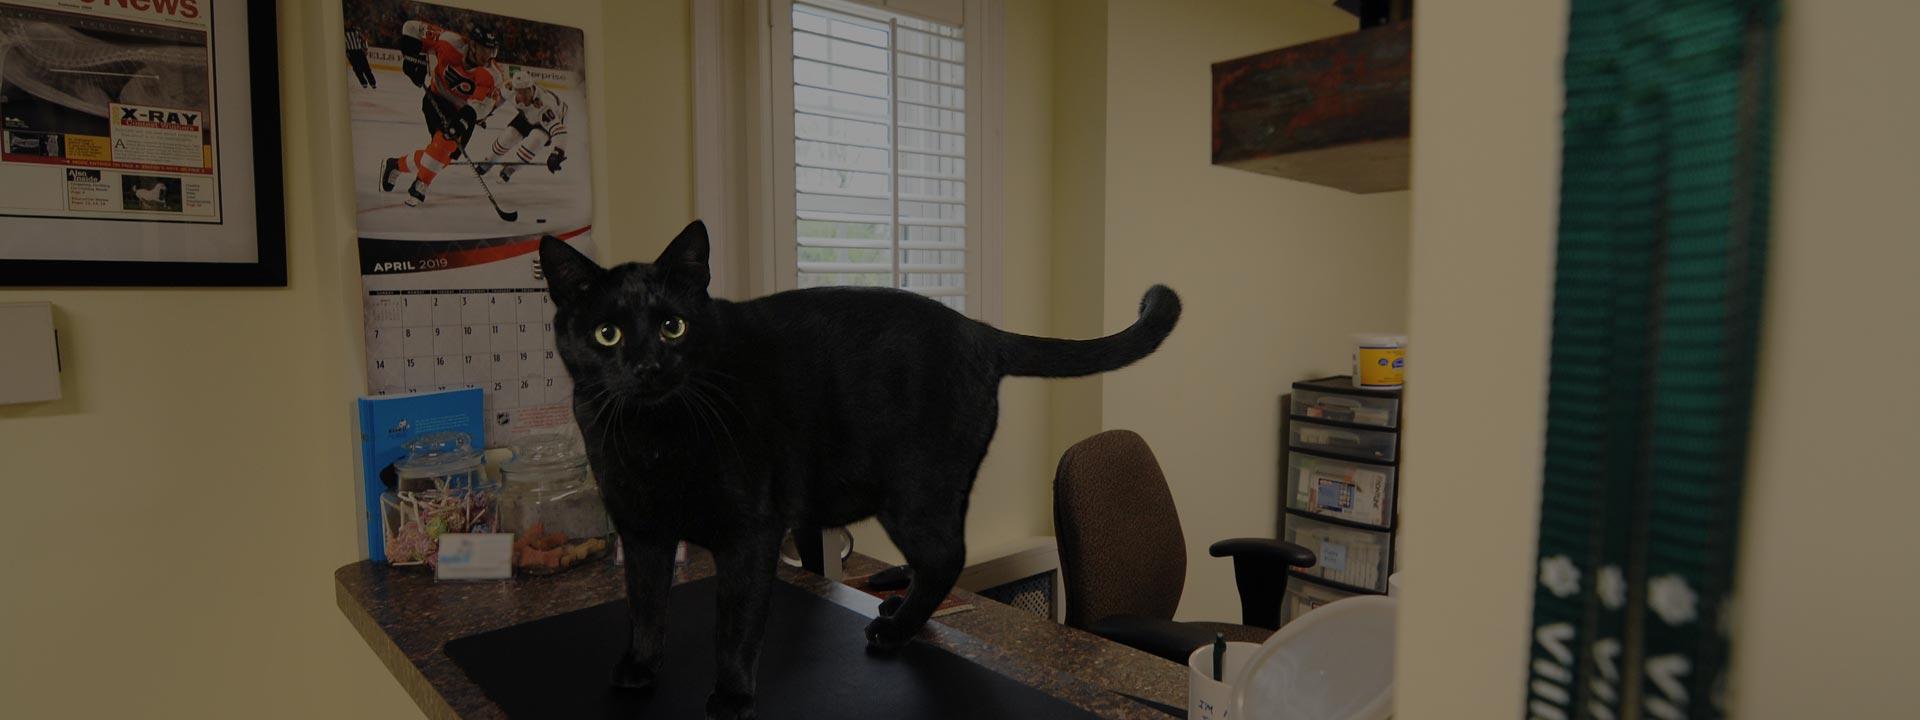 black cat standing on front desk of hospital